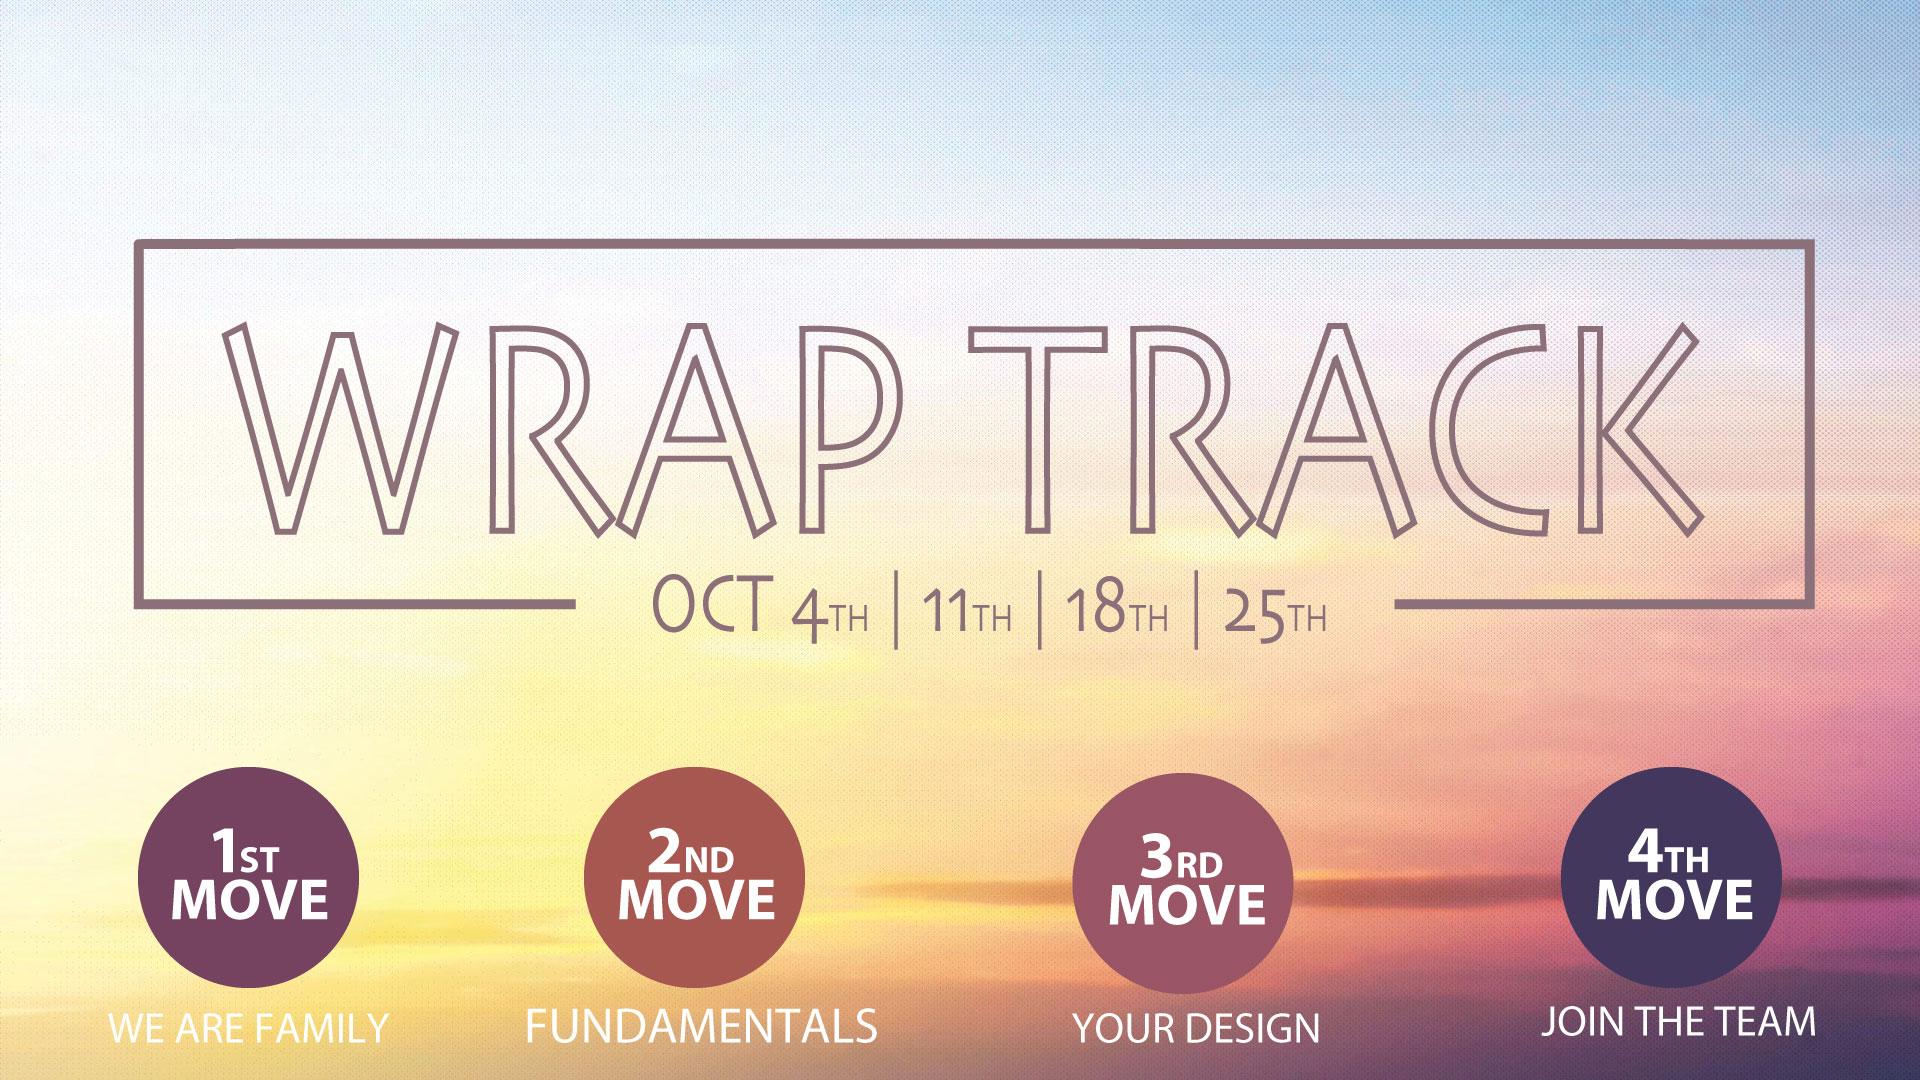 wrap_track_oct2017